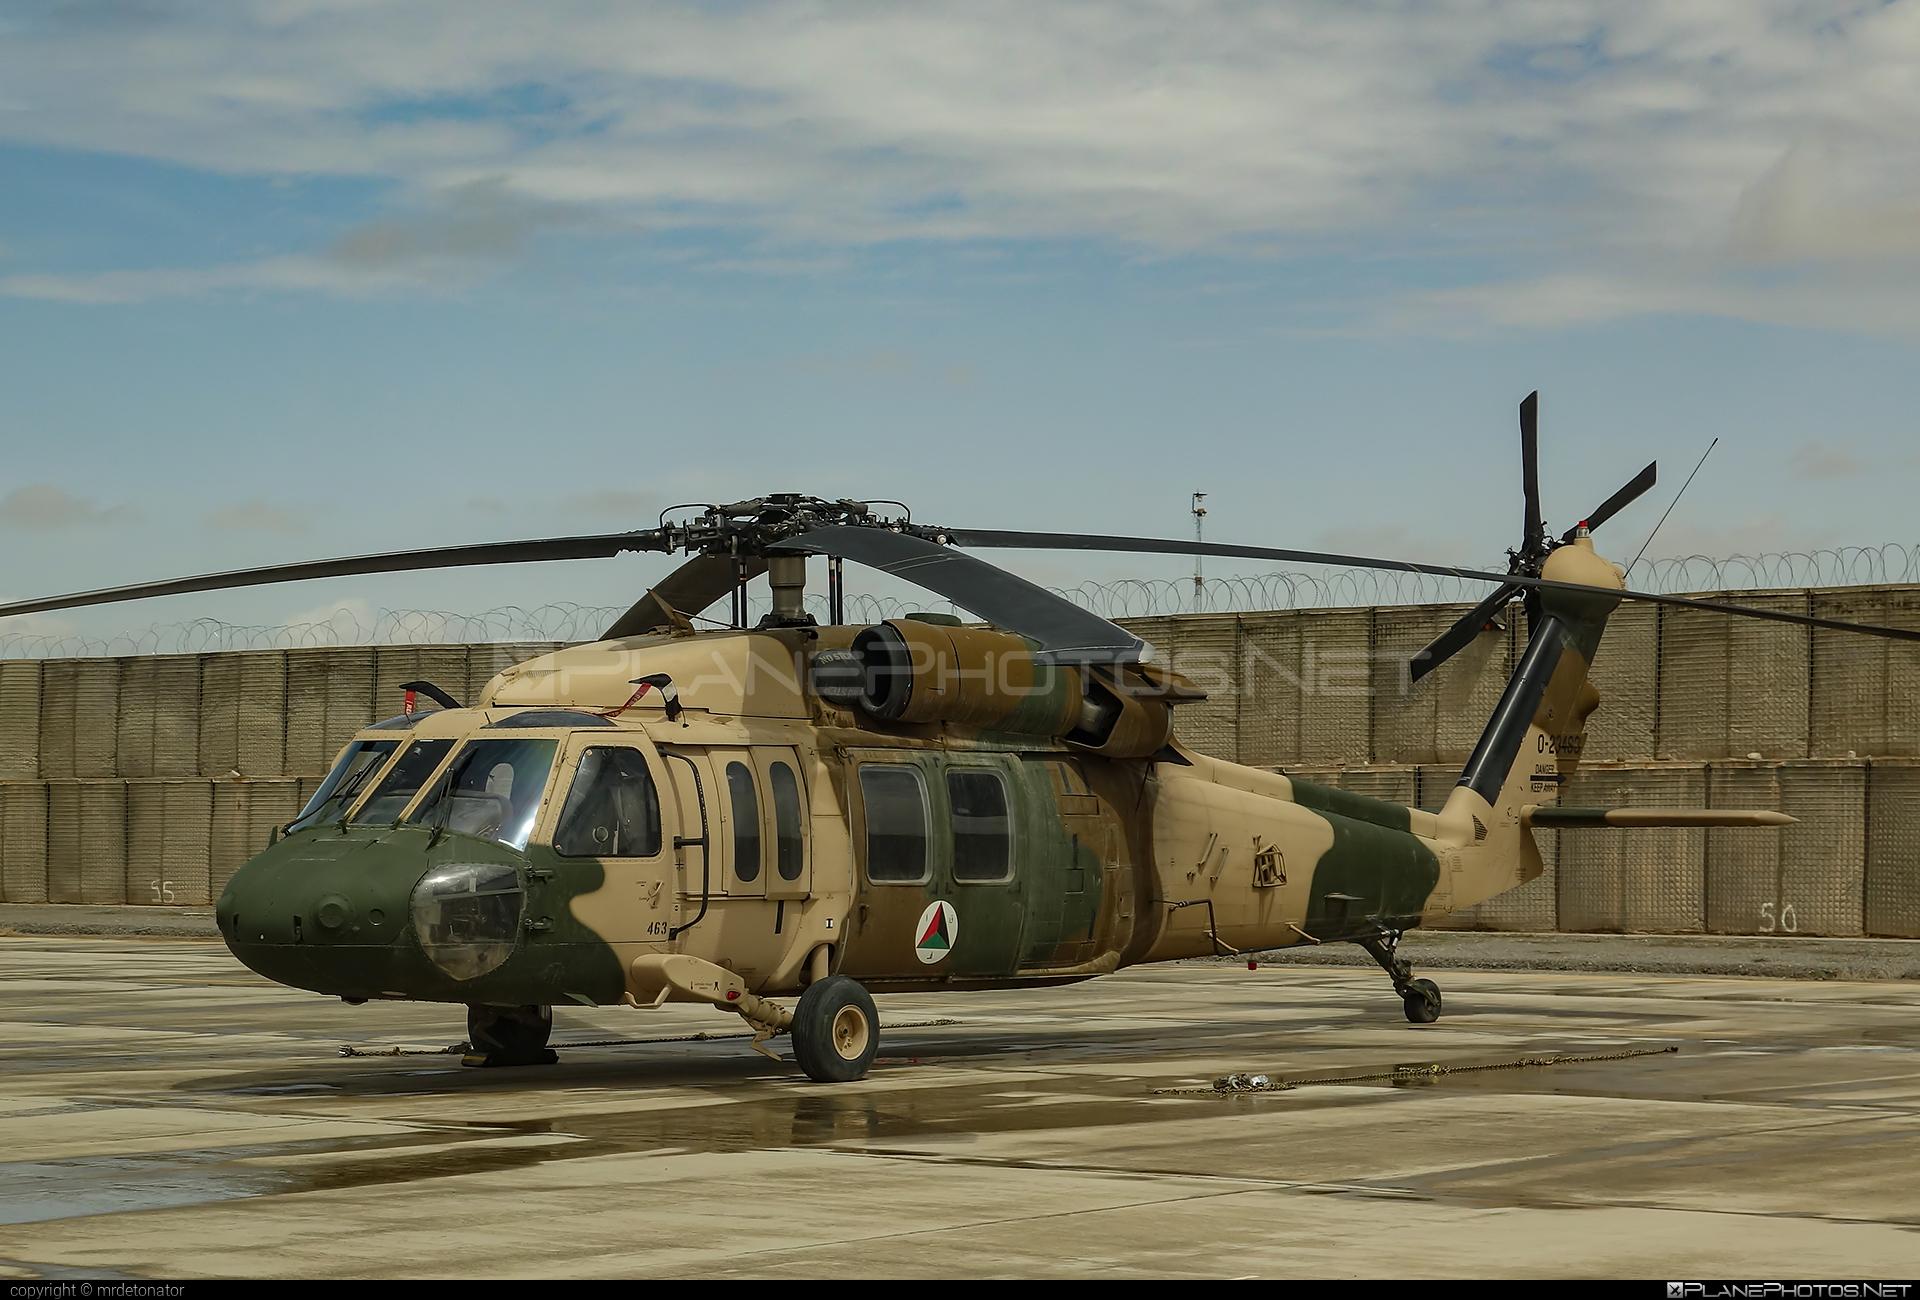 Sikorsky UH-60A Black Hawk - 0-23463 operated by Afghan Air Force #afghanairforce #blackhawk #sikorsky #uh60 #uh60a #uh60blackhawk